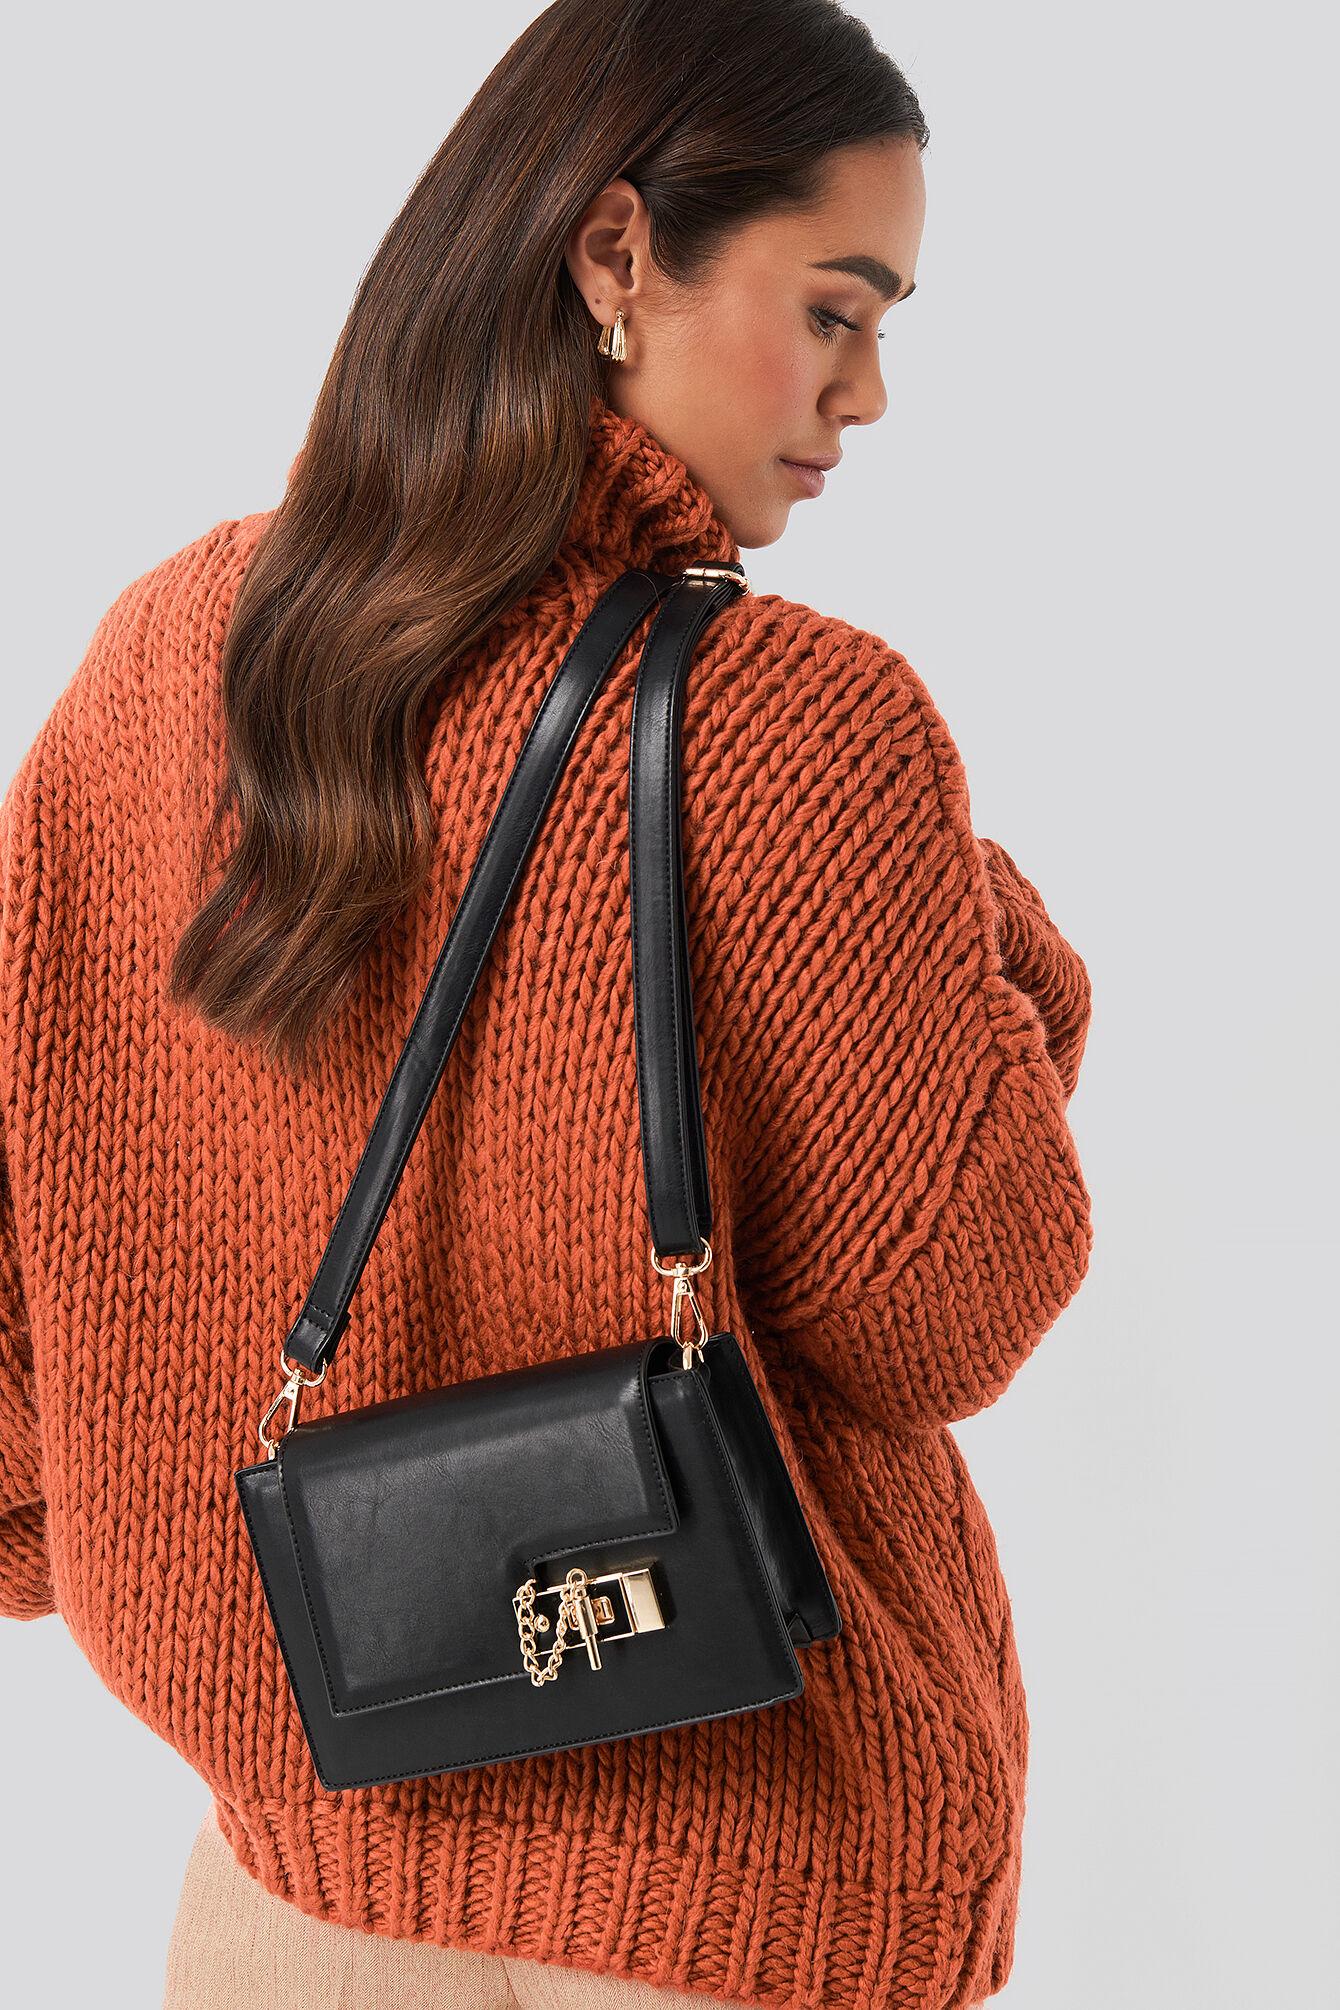 NA-KD Accessories Wide Slide Closure Bag - Black  - Size: One Size